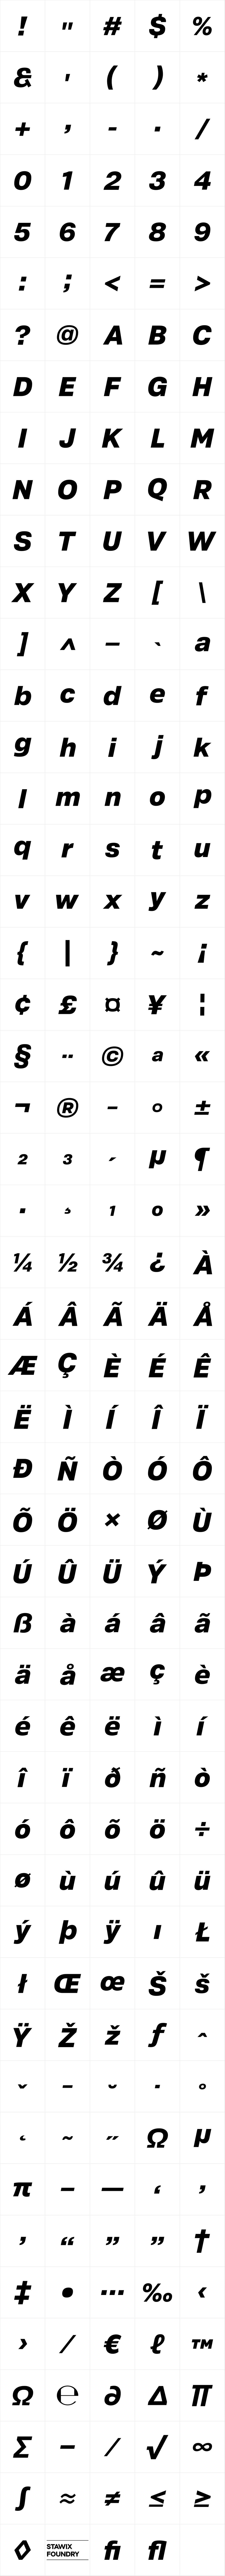 Crique Grotesk Display Heavy Italic